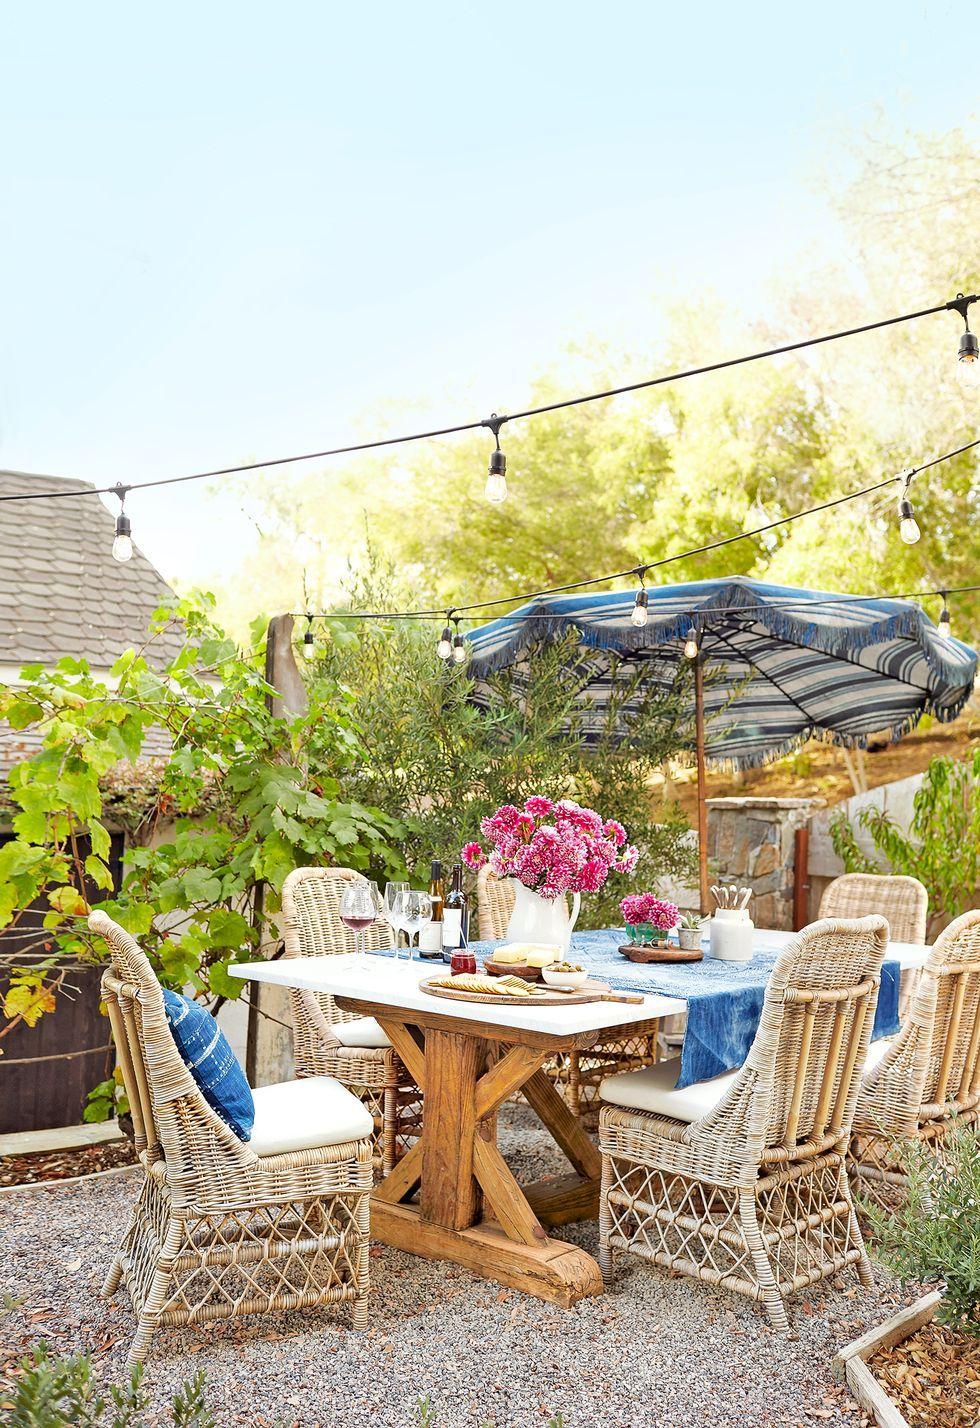 20 Small Backyard Ideas Small Backyard Landscaping And Patio Designs